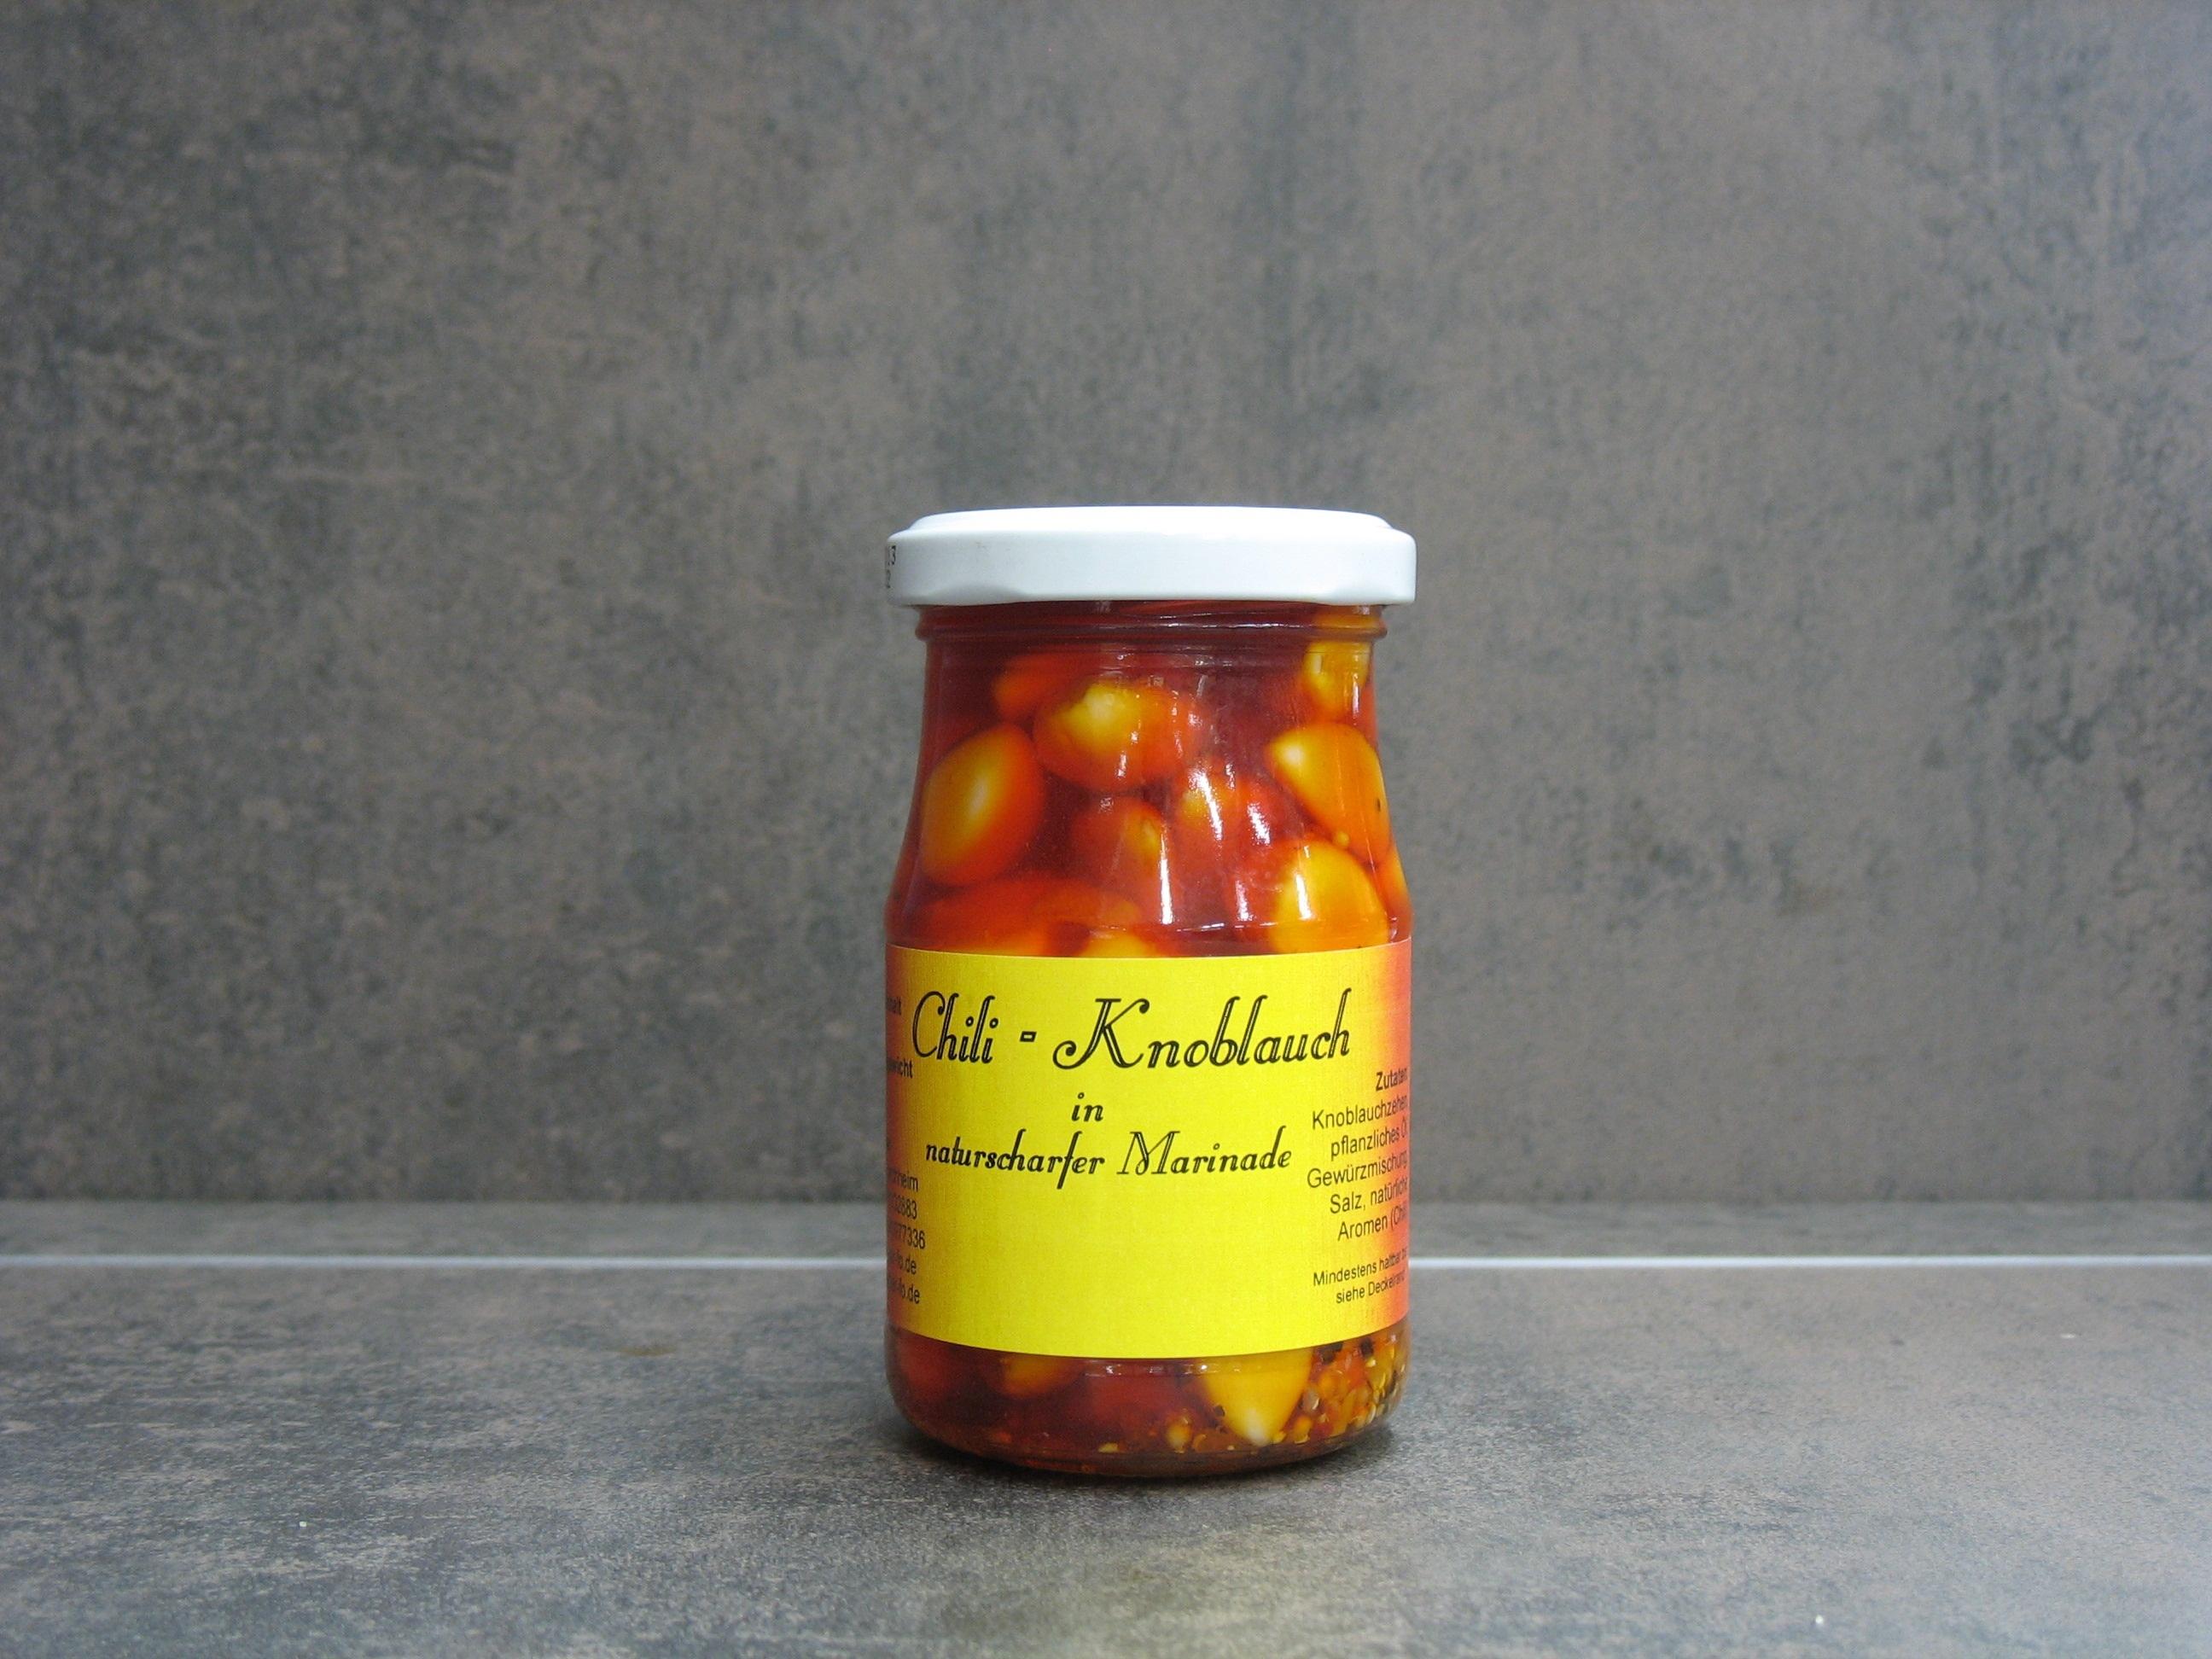 Chili - Knoblauch in scharfer Marinade